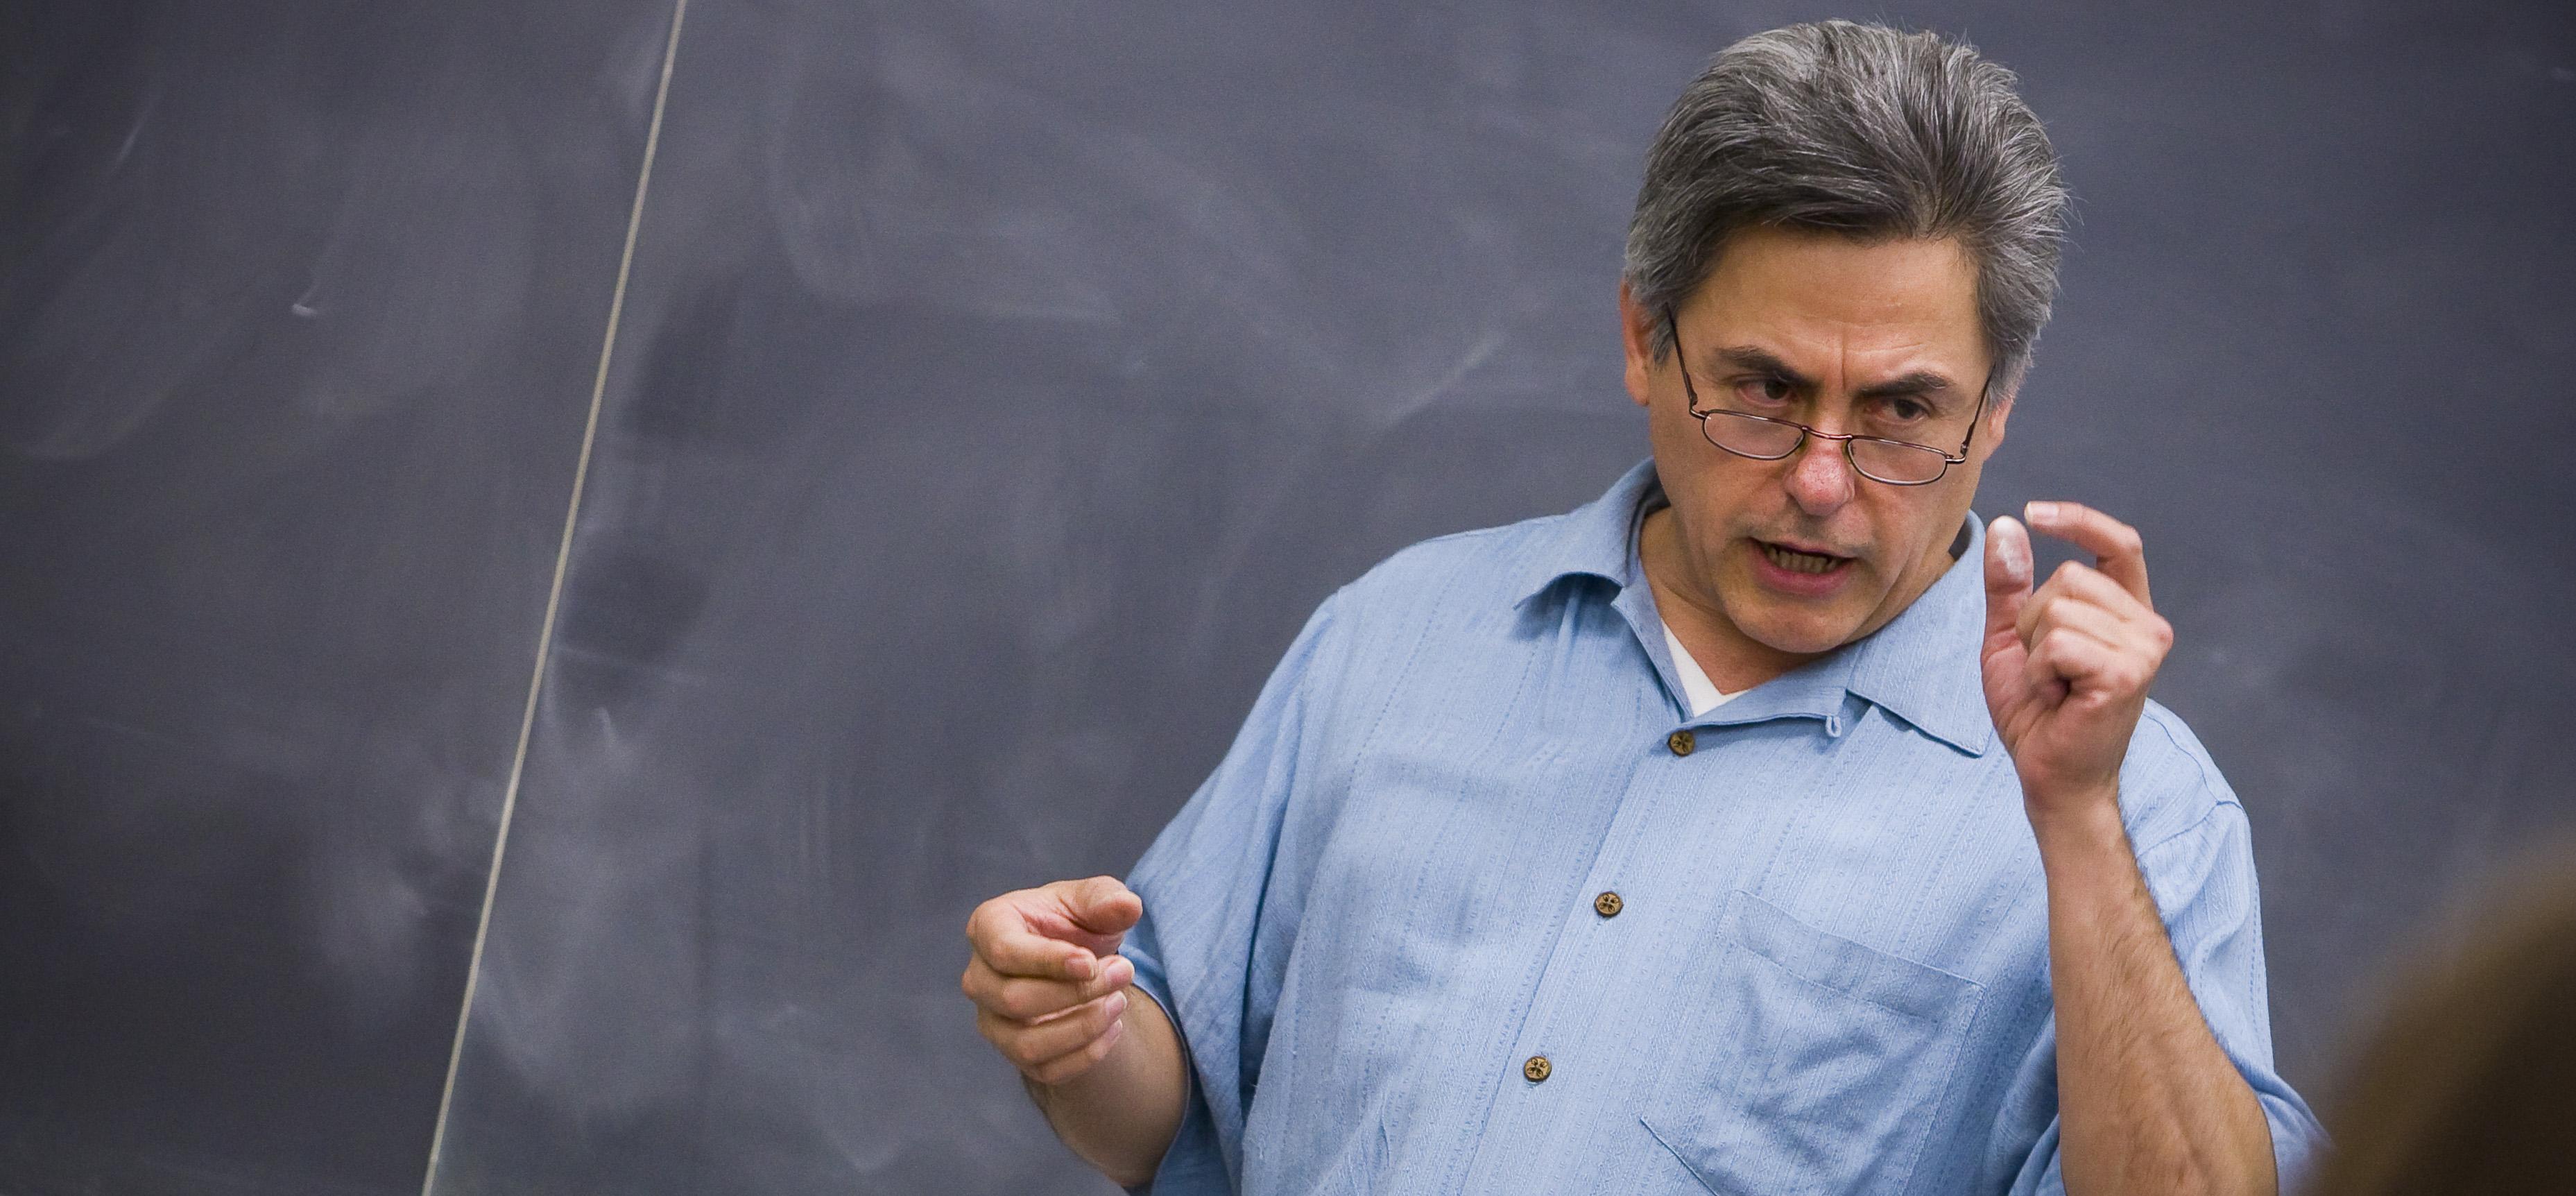 Professor Dick teaching